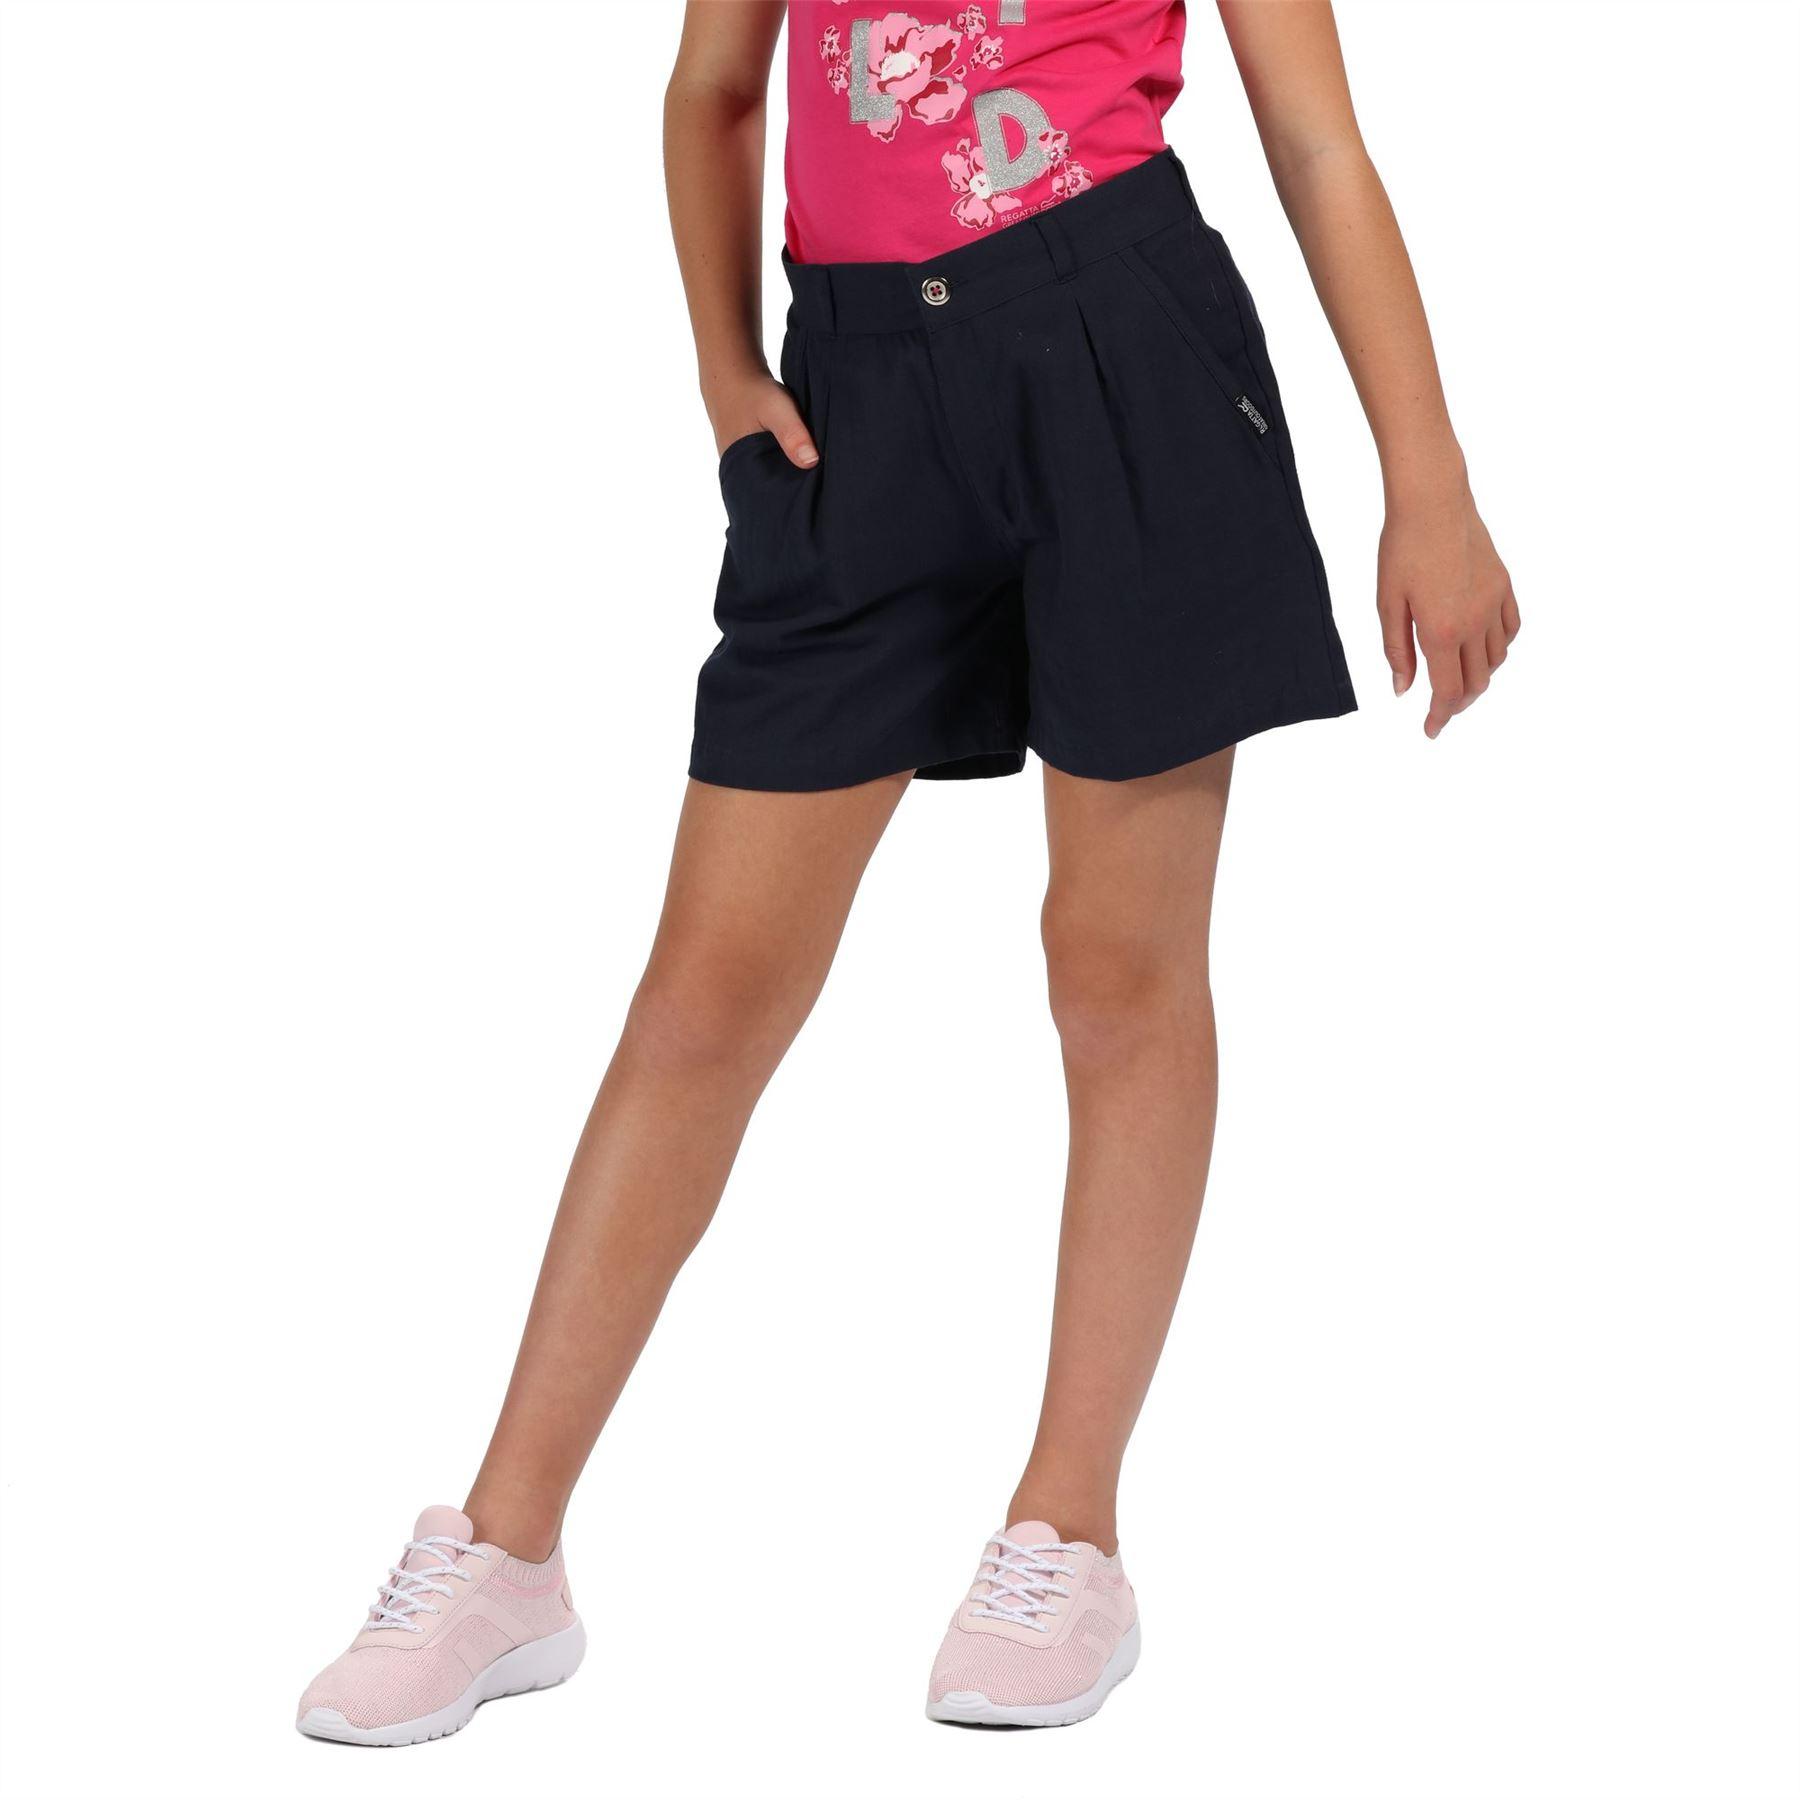 miniatuur 2 - Regatta DAMITA Childrens Coolweave Shorts Girls